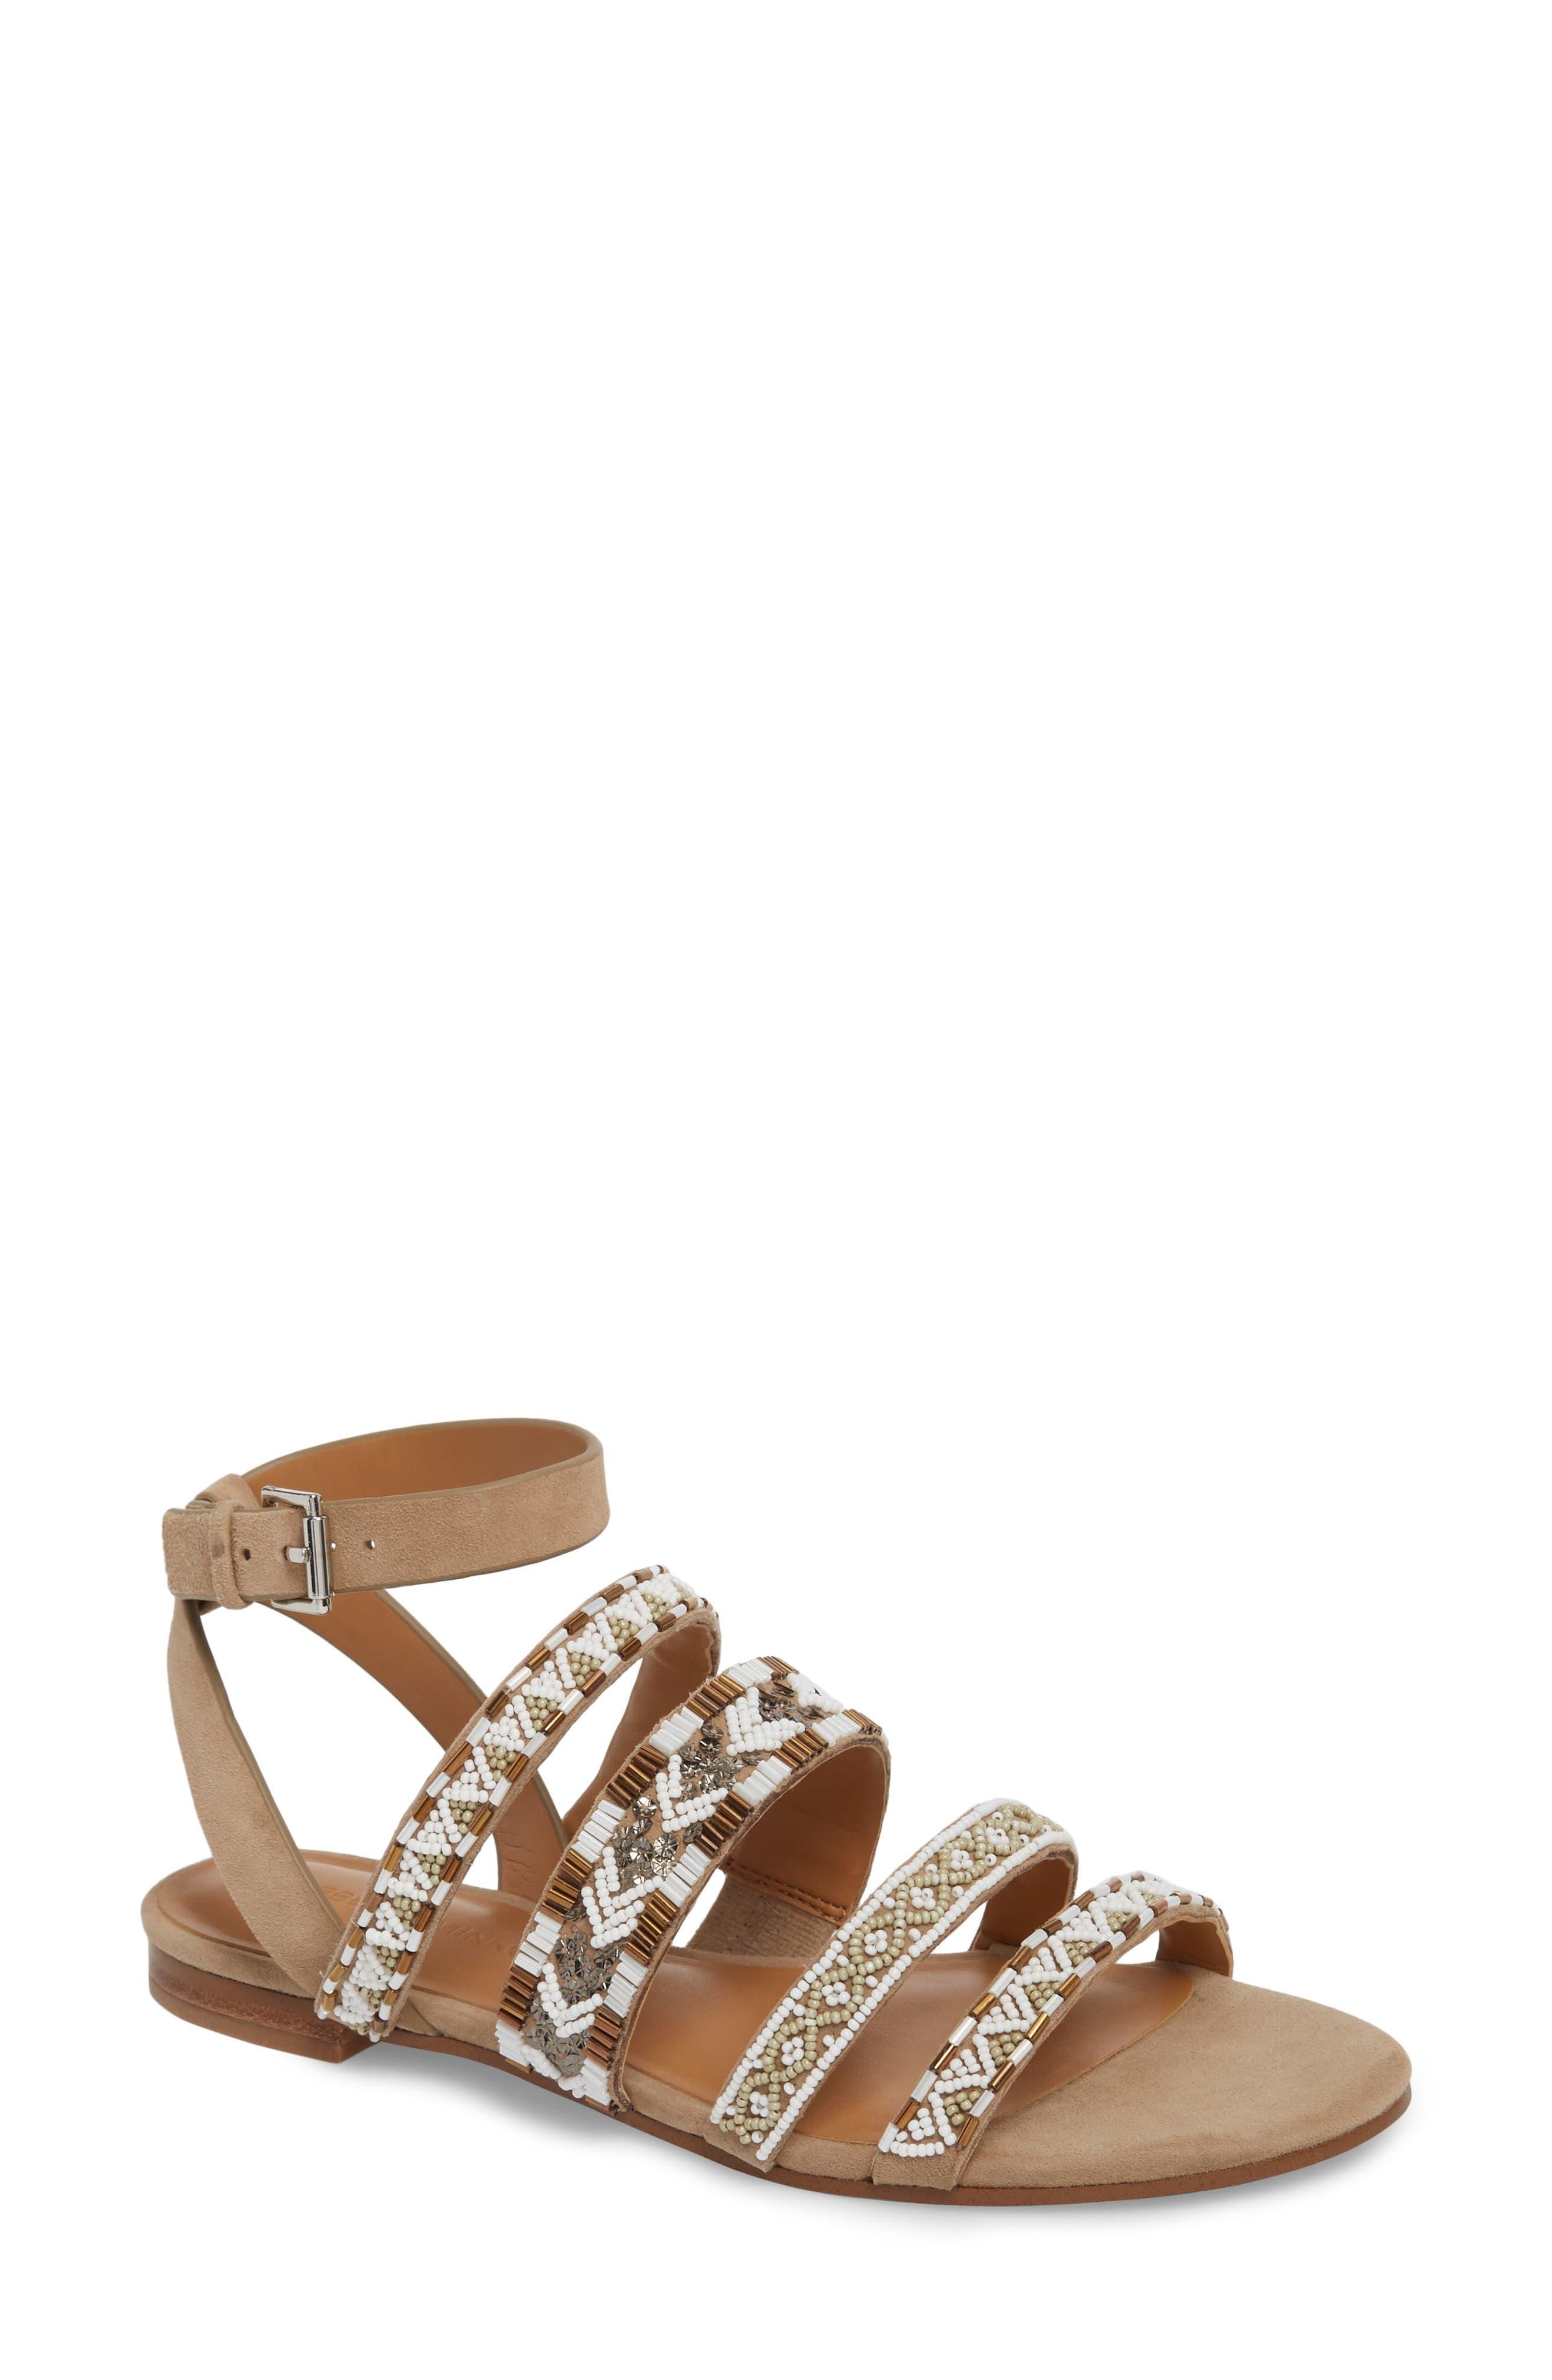 Leila Strappy Sandal,                         Main,                         color, 279